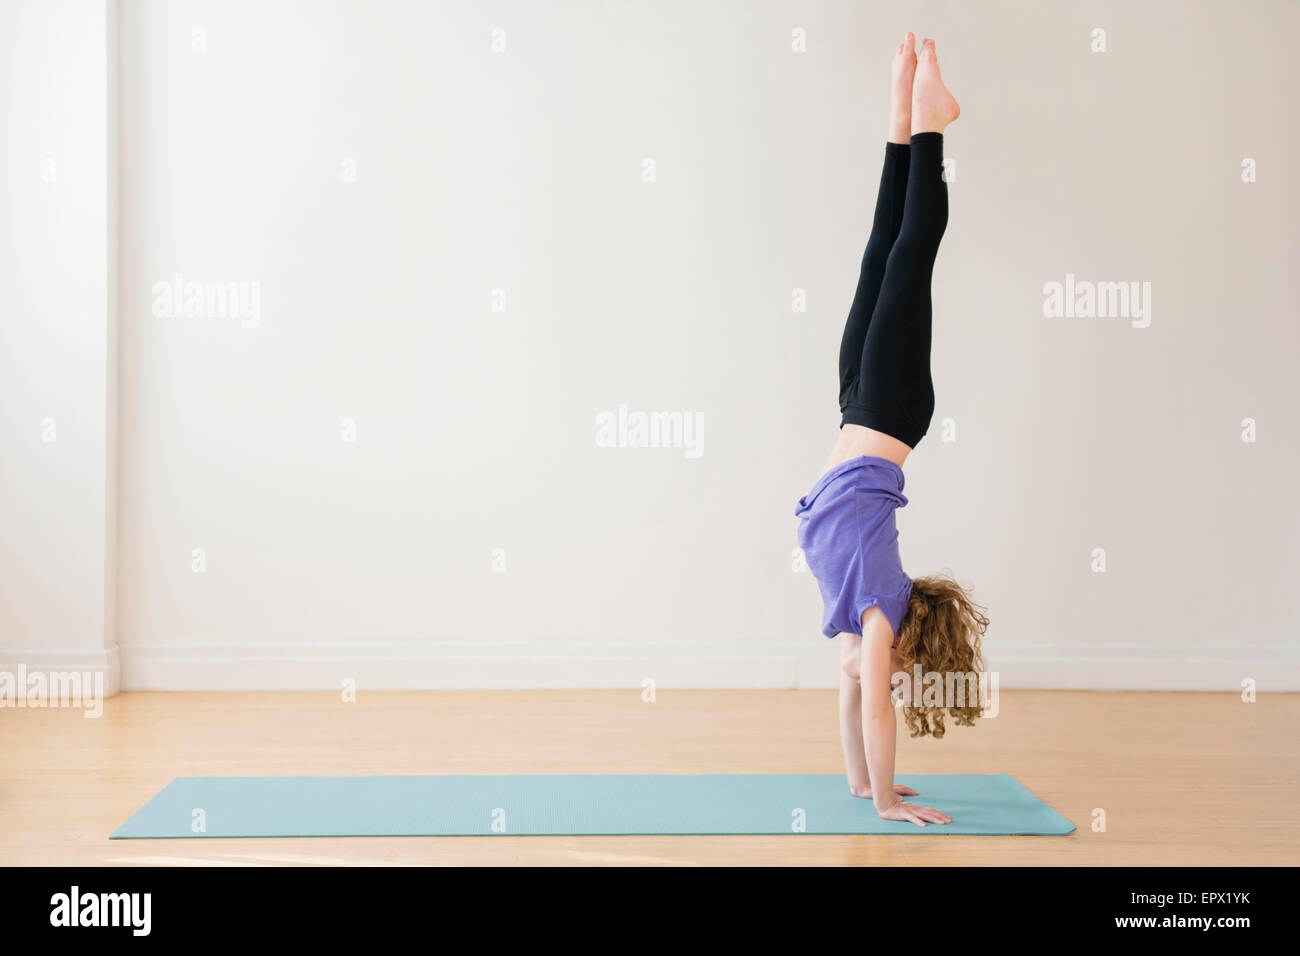 Girl (10-11) doing handstand - Stock Image